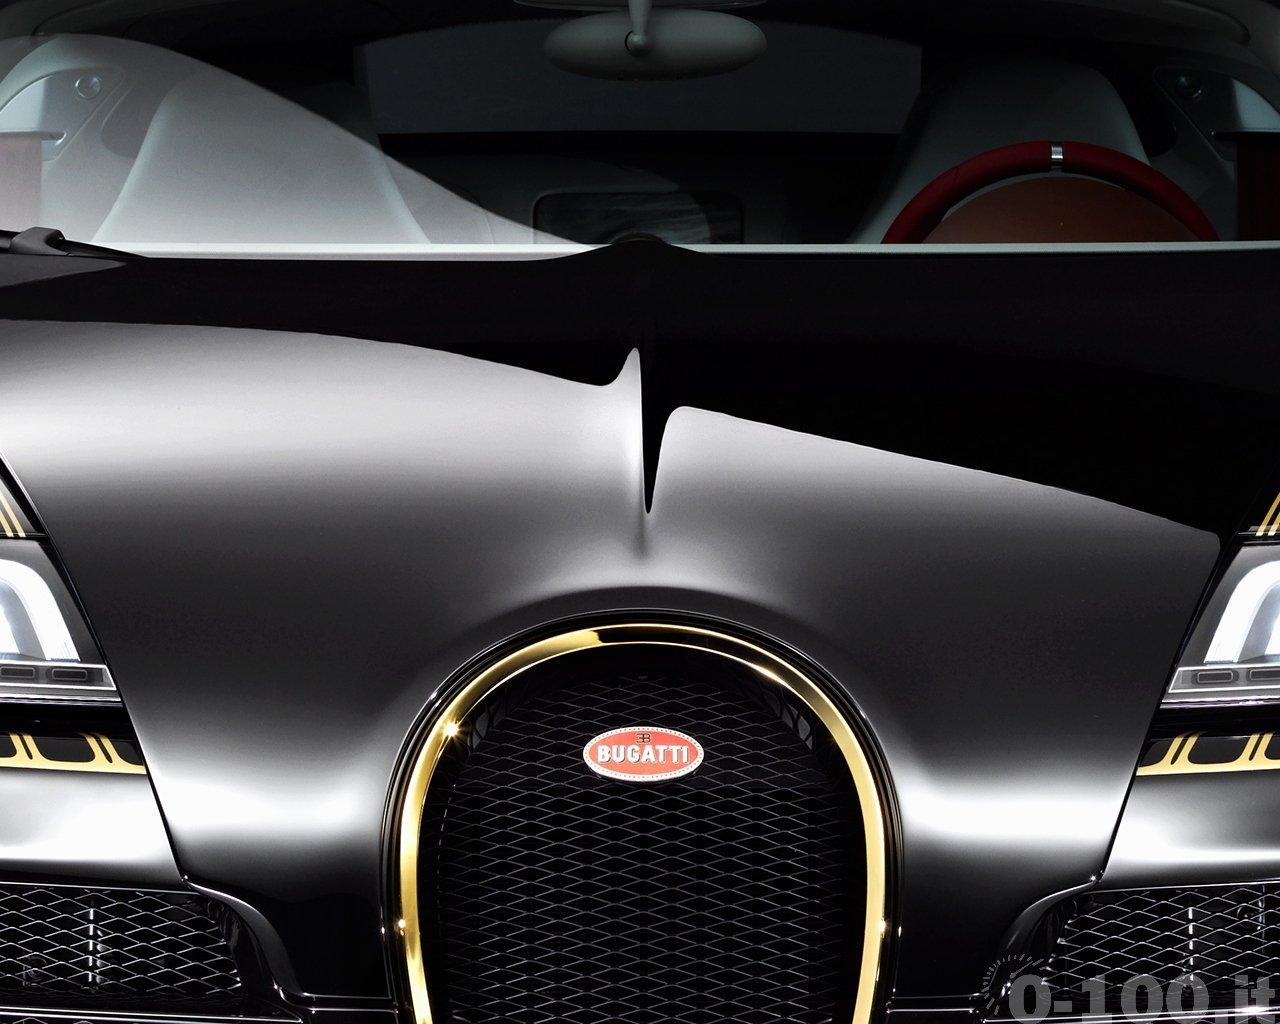 beijing-2014-bugatti-veyron-serie-speciale-les-legendes-de-bugatti-veyron-16-4-grand-sport-vitesse-black-bess_16